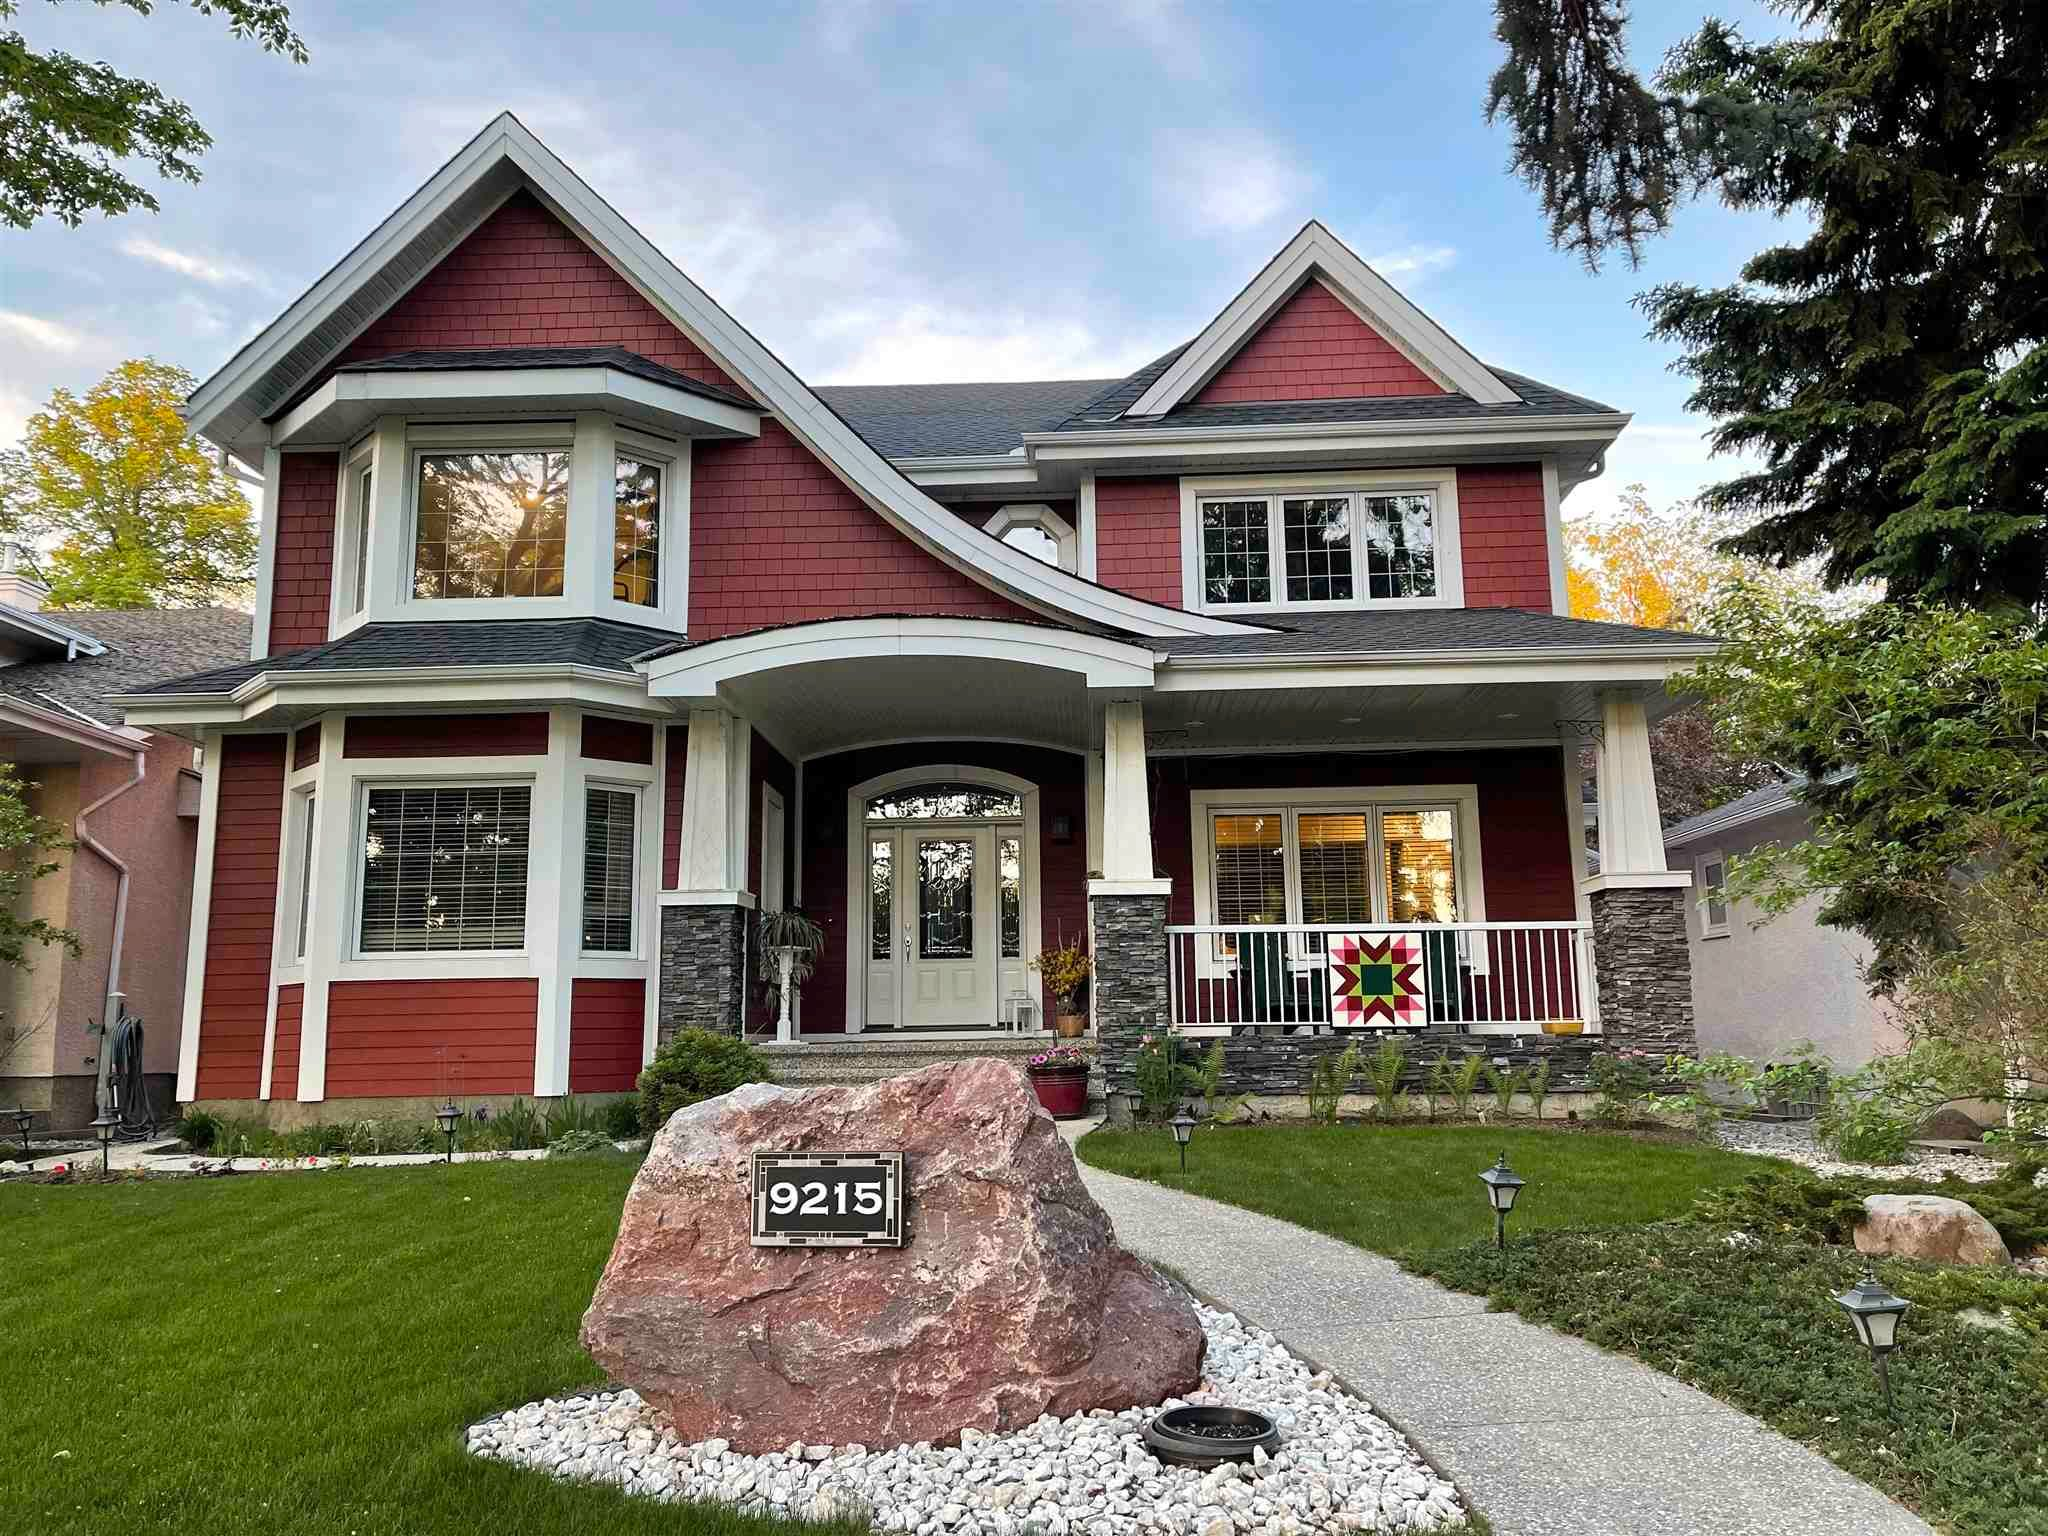 Main Photo: 9215 118 Street in Edmonton: Zone 15 House for sale : MLS®# E4247486